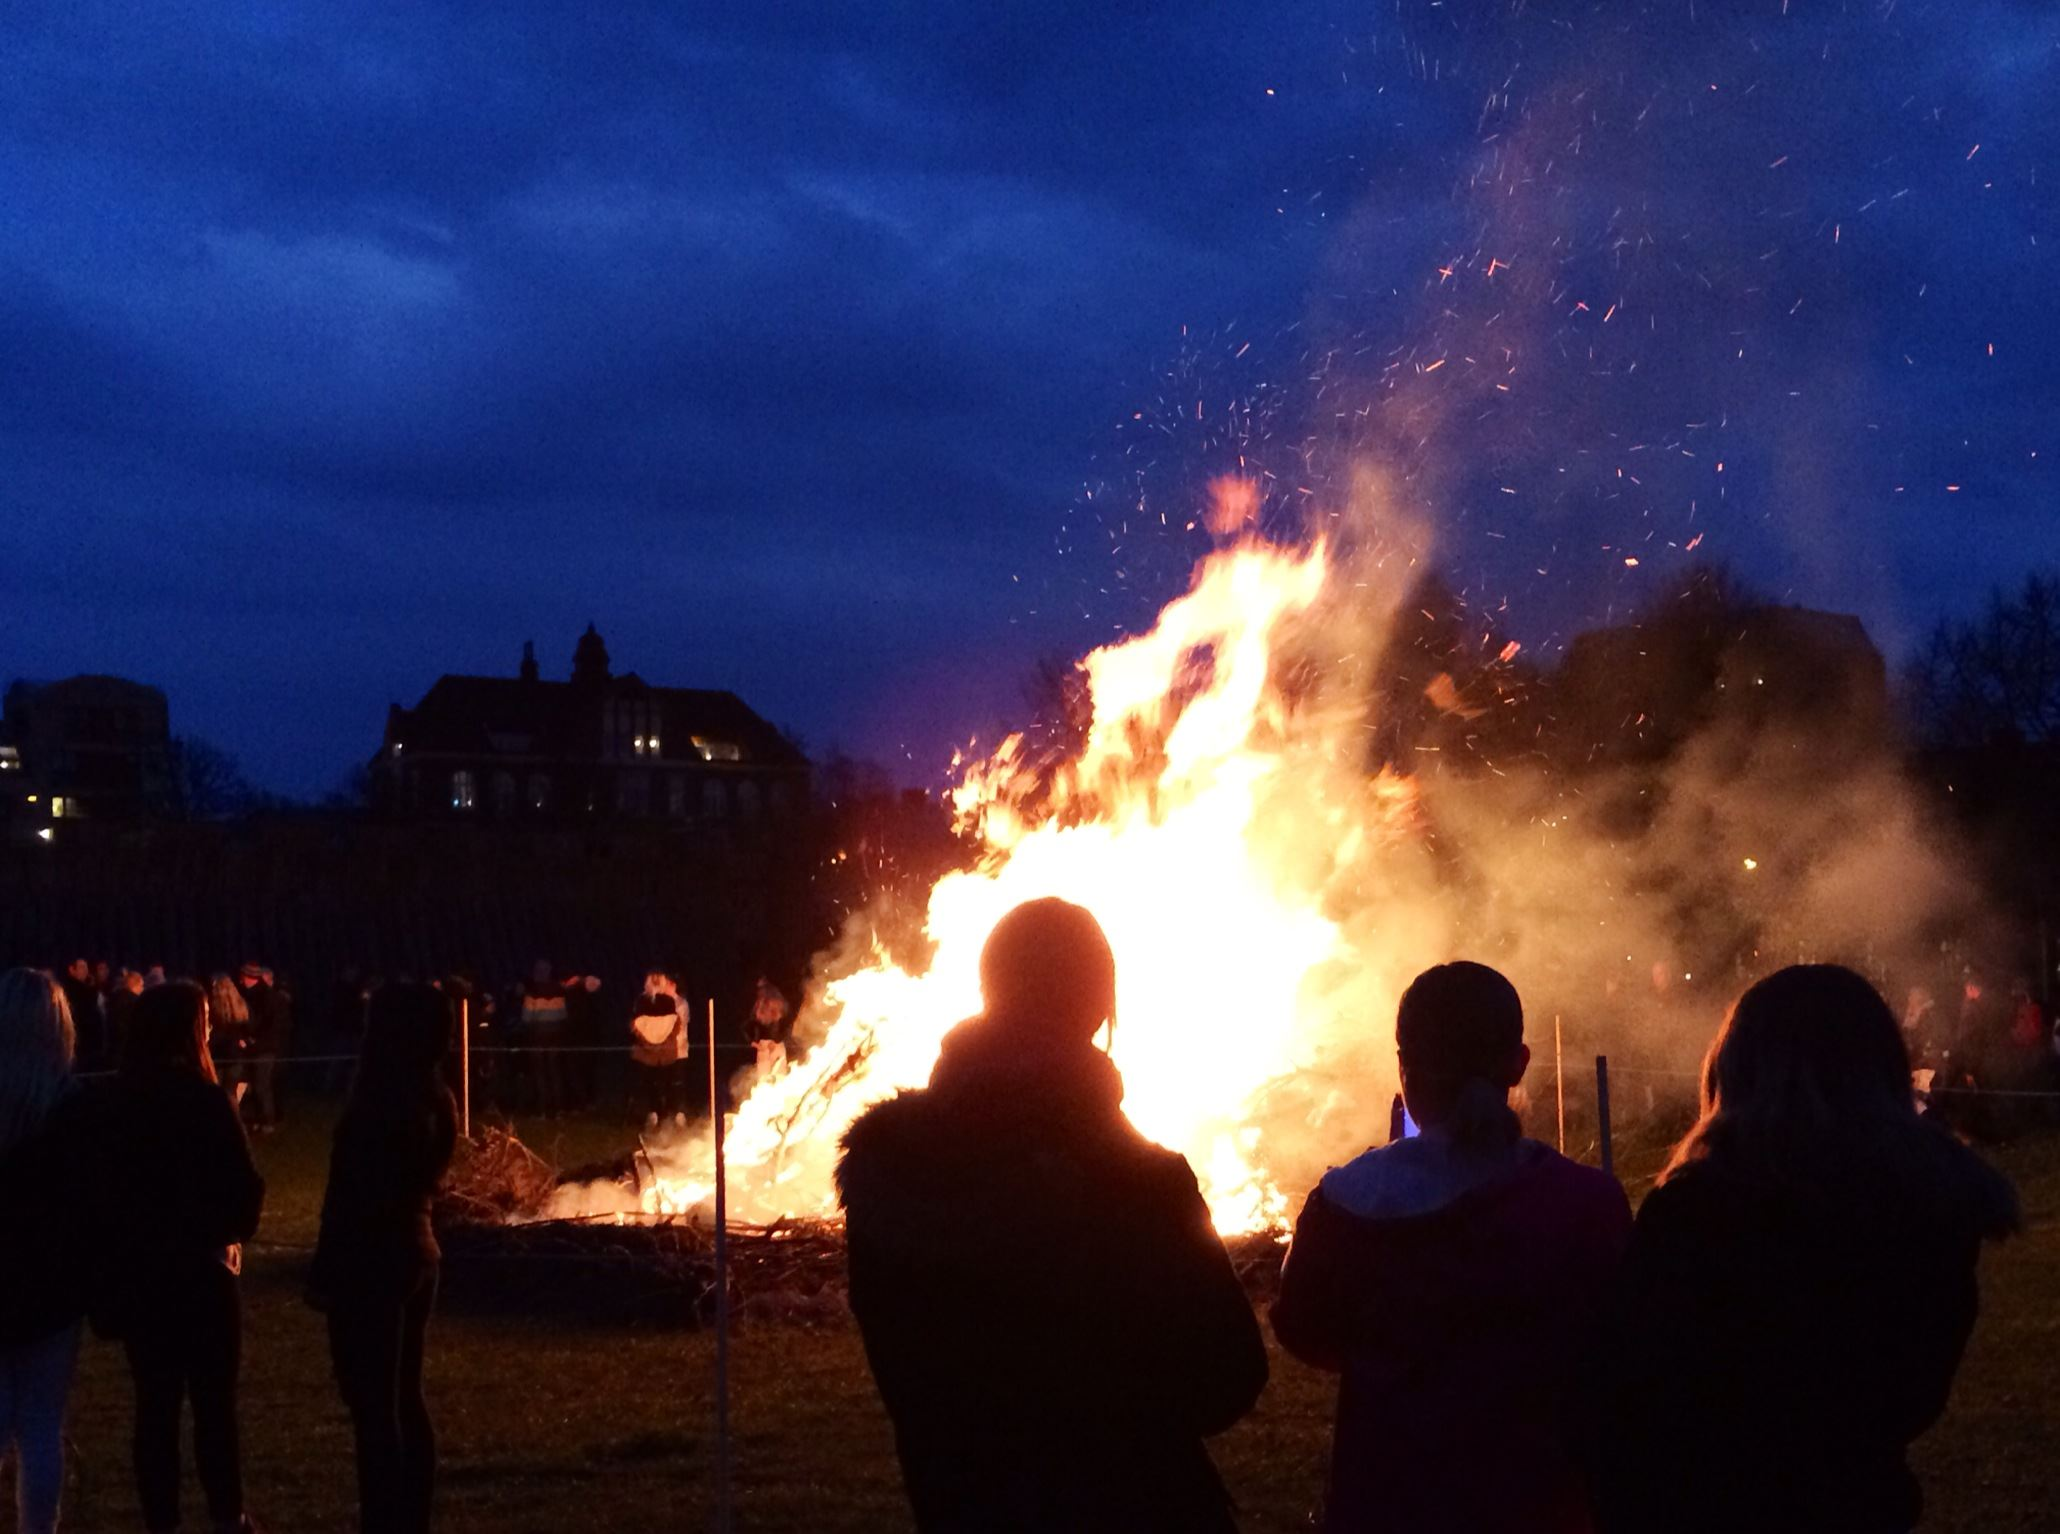 Linda Olofsson, Celebrate Valborg at the Viking fortress.